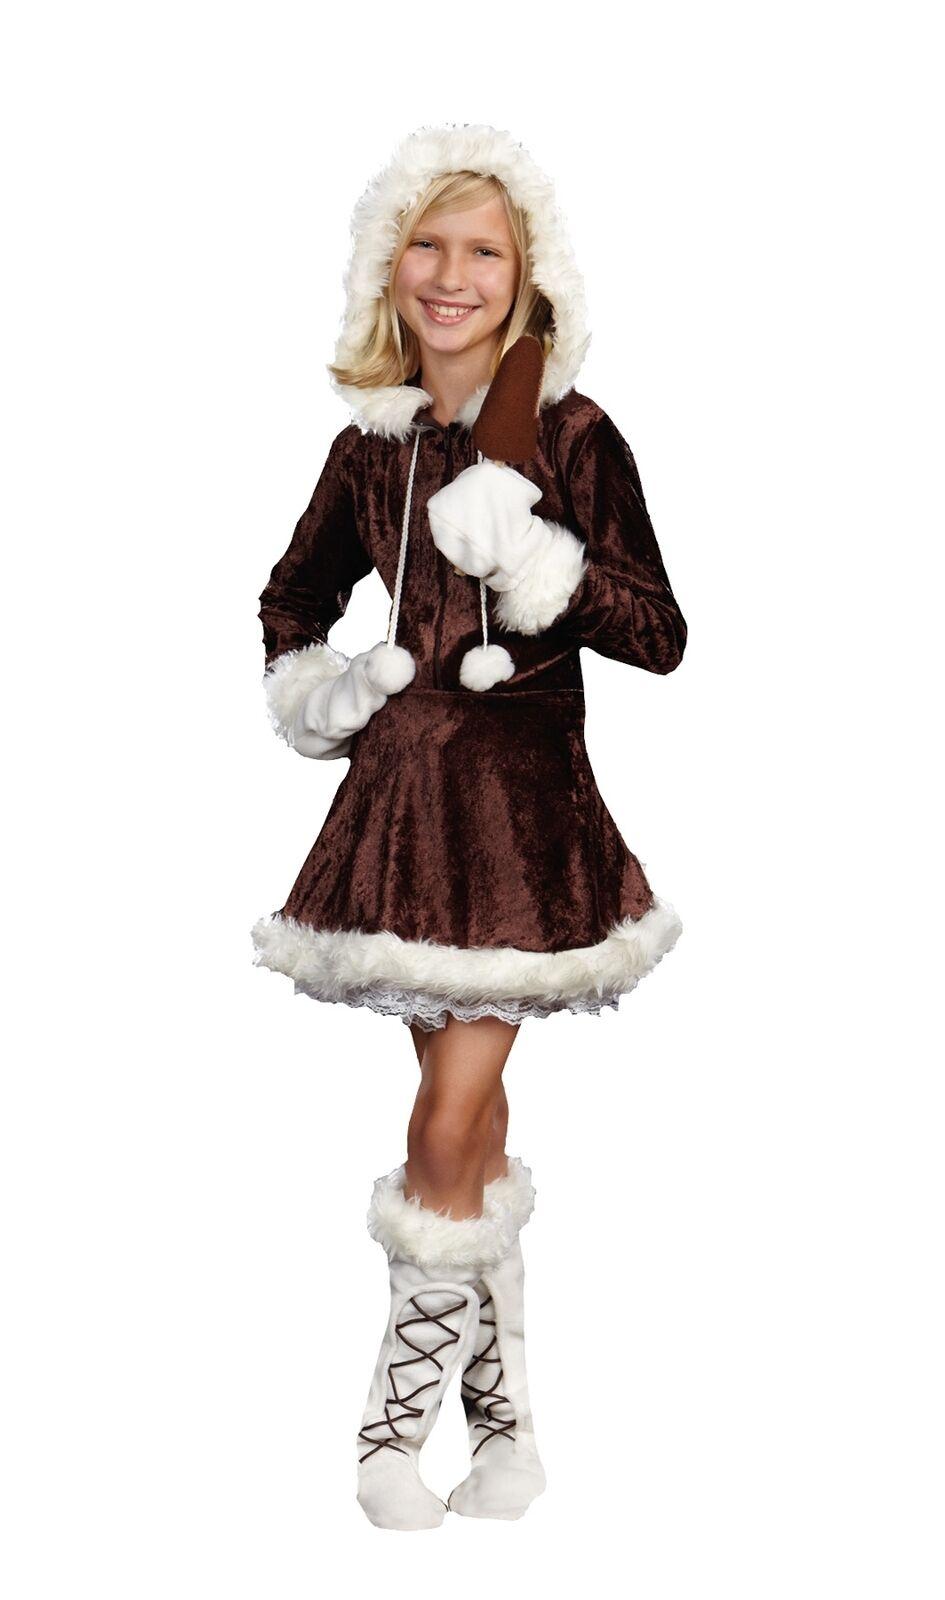 Eskimo Cutie Pie Child Girls Costume Velvet Christmas Fancy Dress